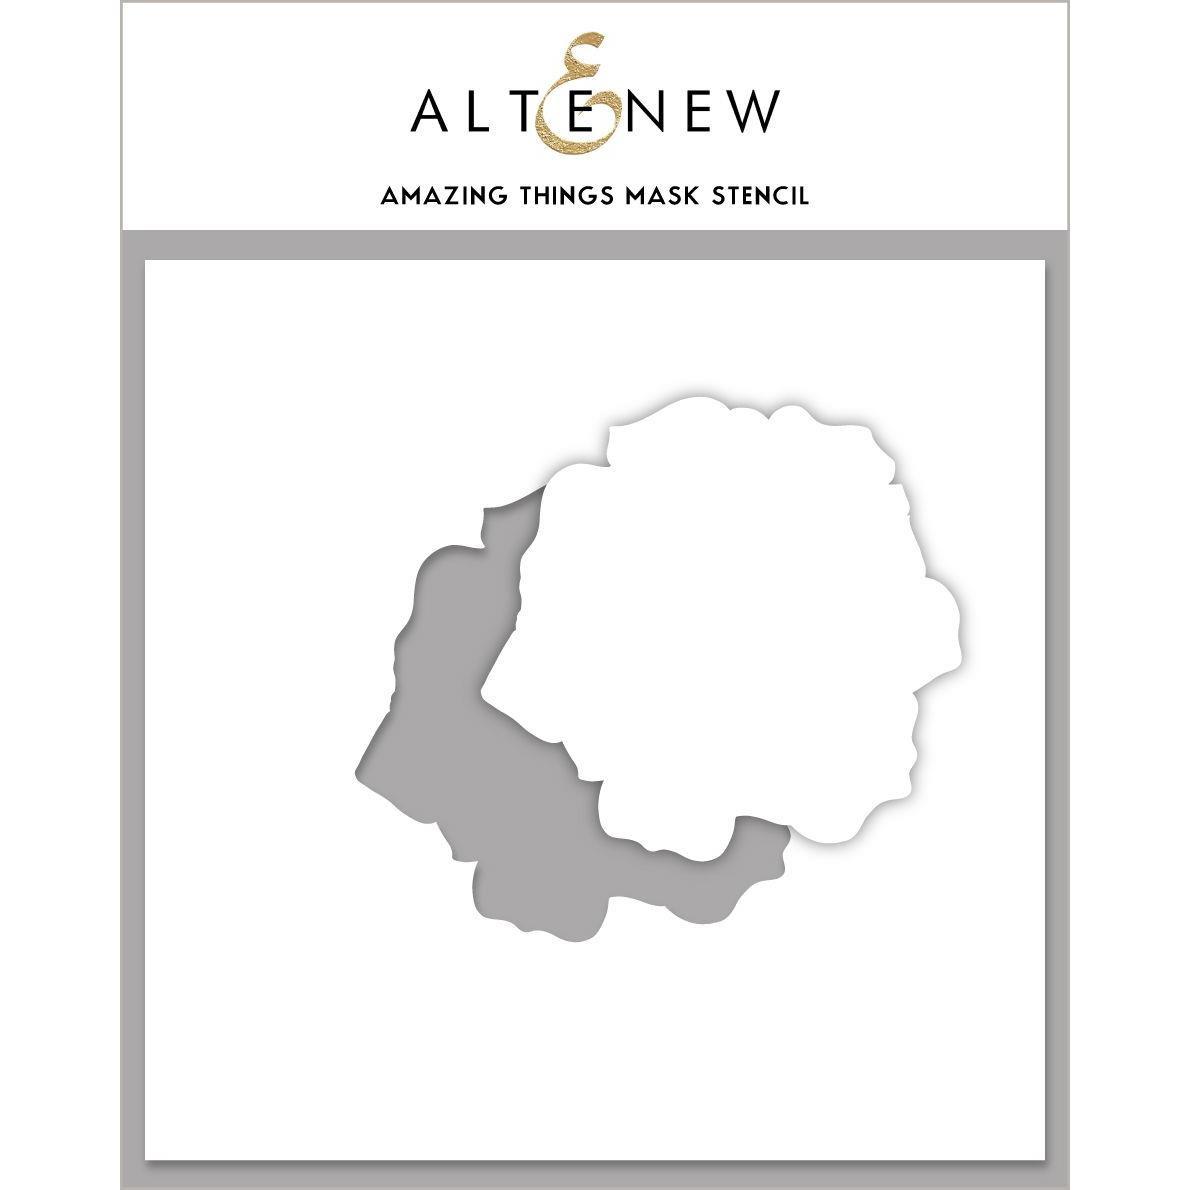 Amazing Things, Altenew Mask Stencil - 737787264805